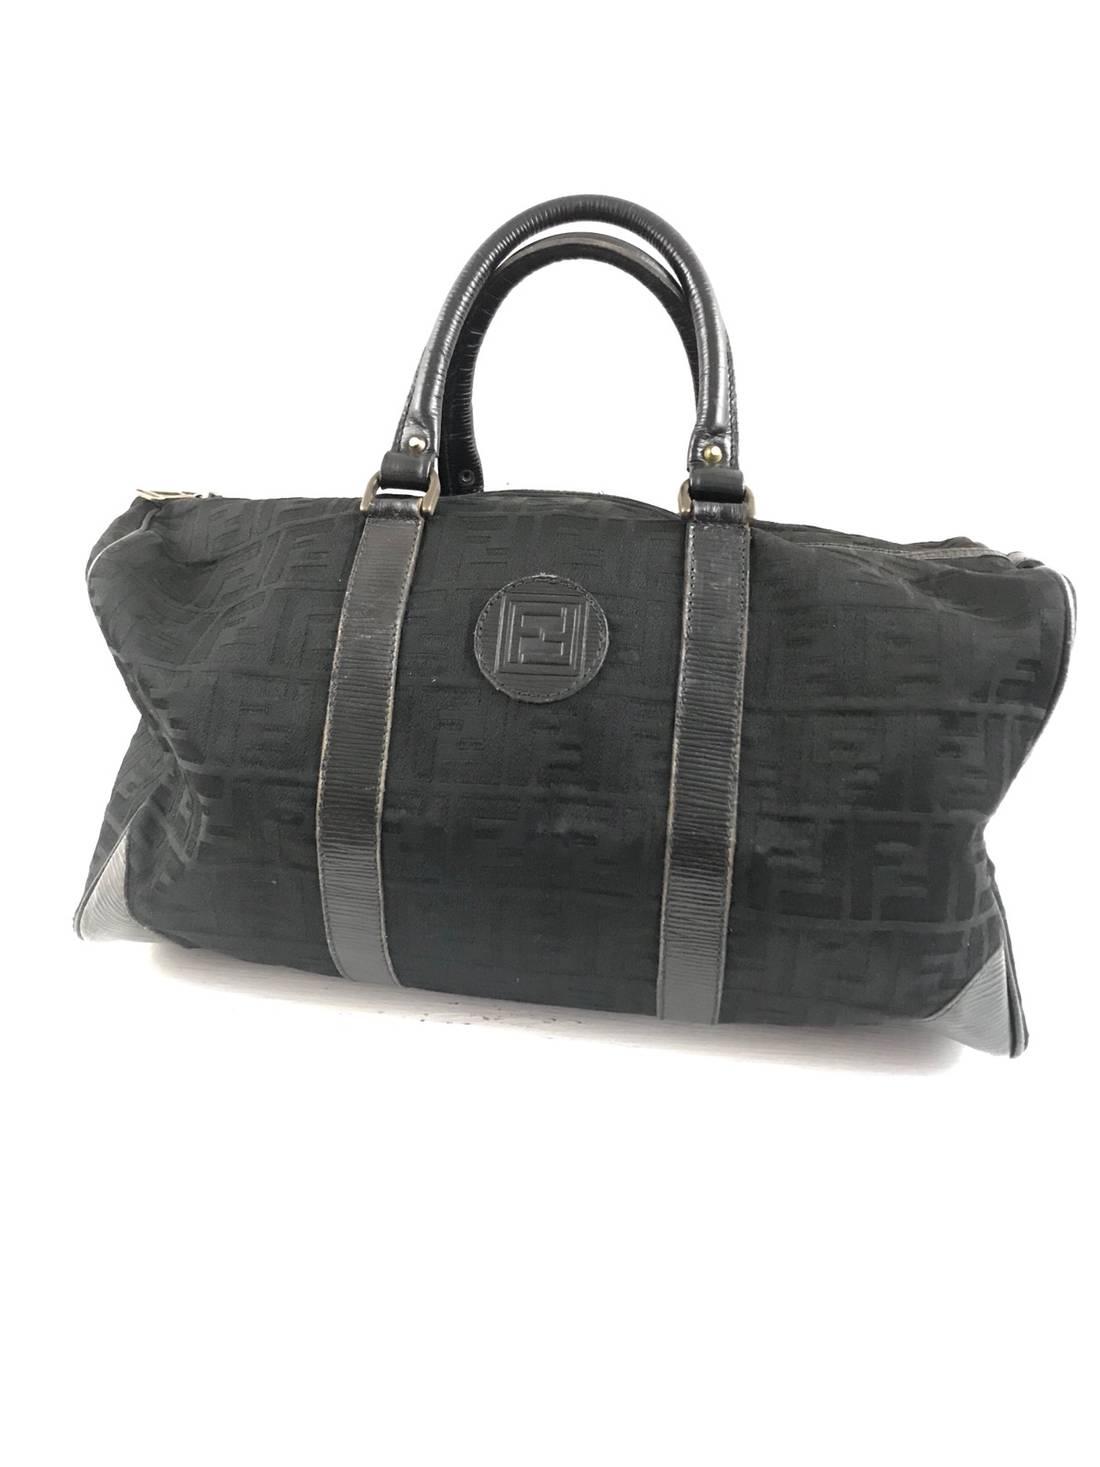 ... sale fendi duffle bag size one size 1 c0d46 ef98f ... 512f4e4af317e